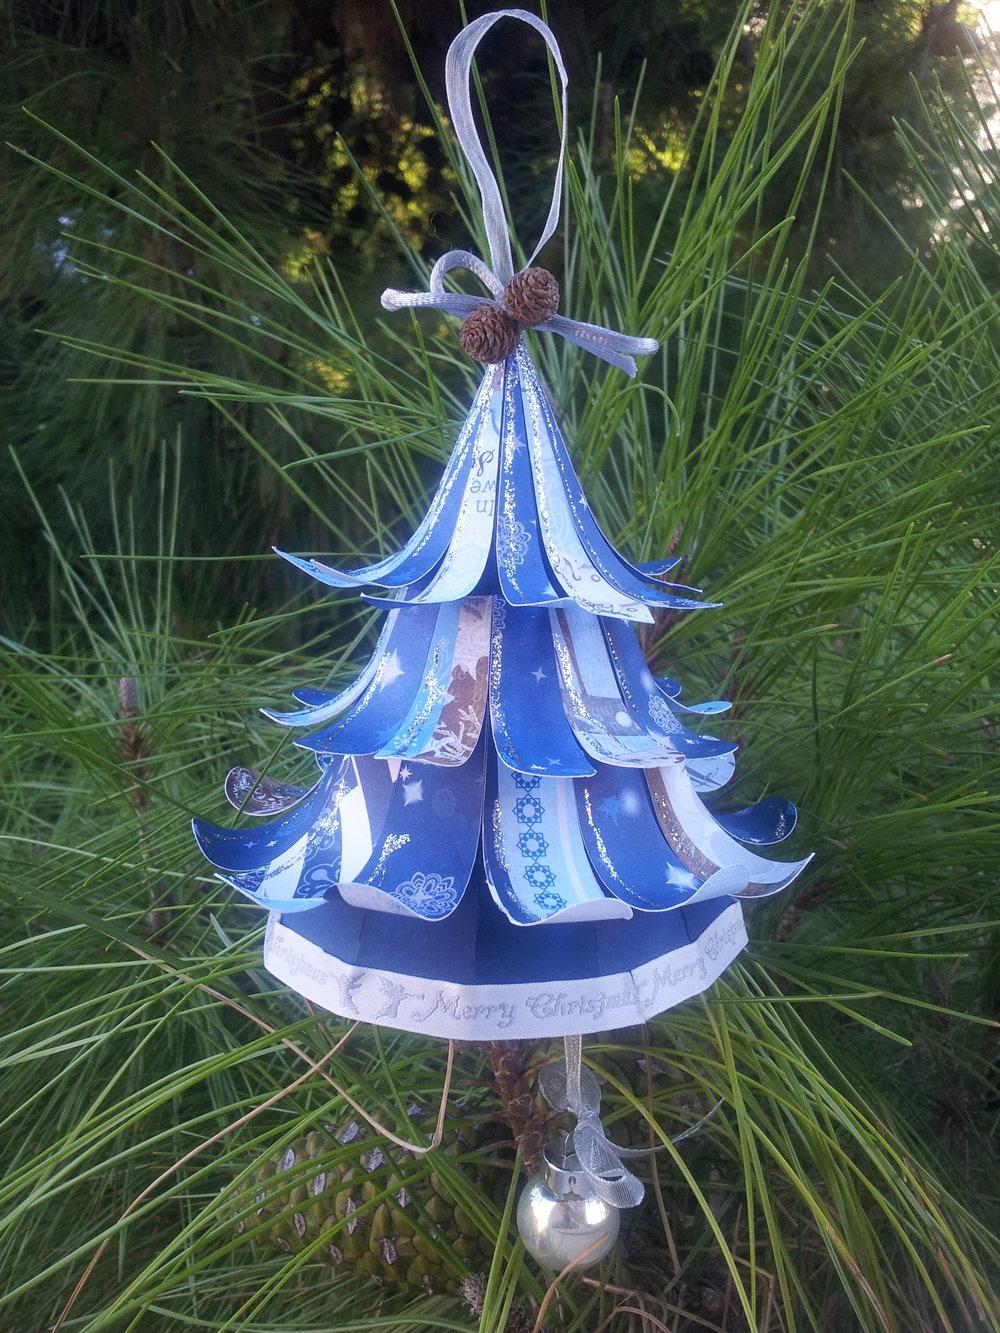 2. Hanging Christmas Tree Ornament